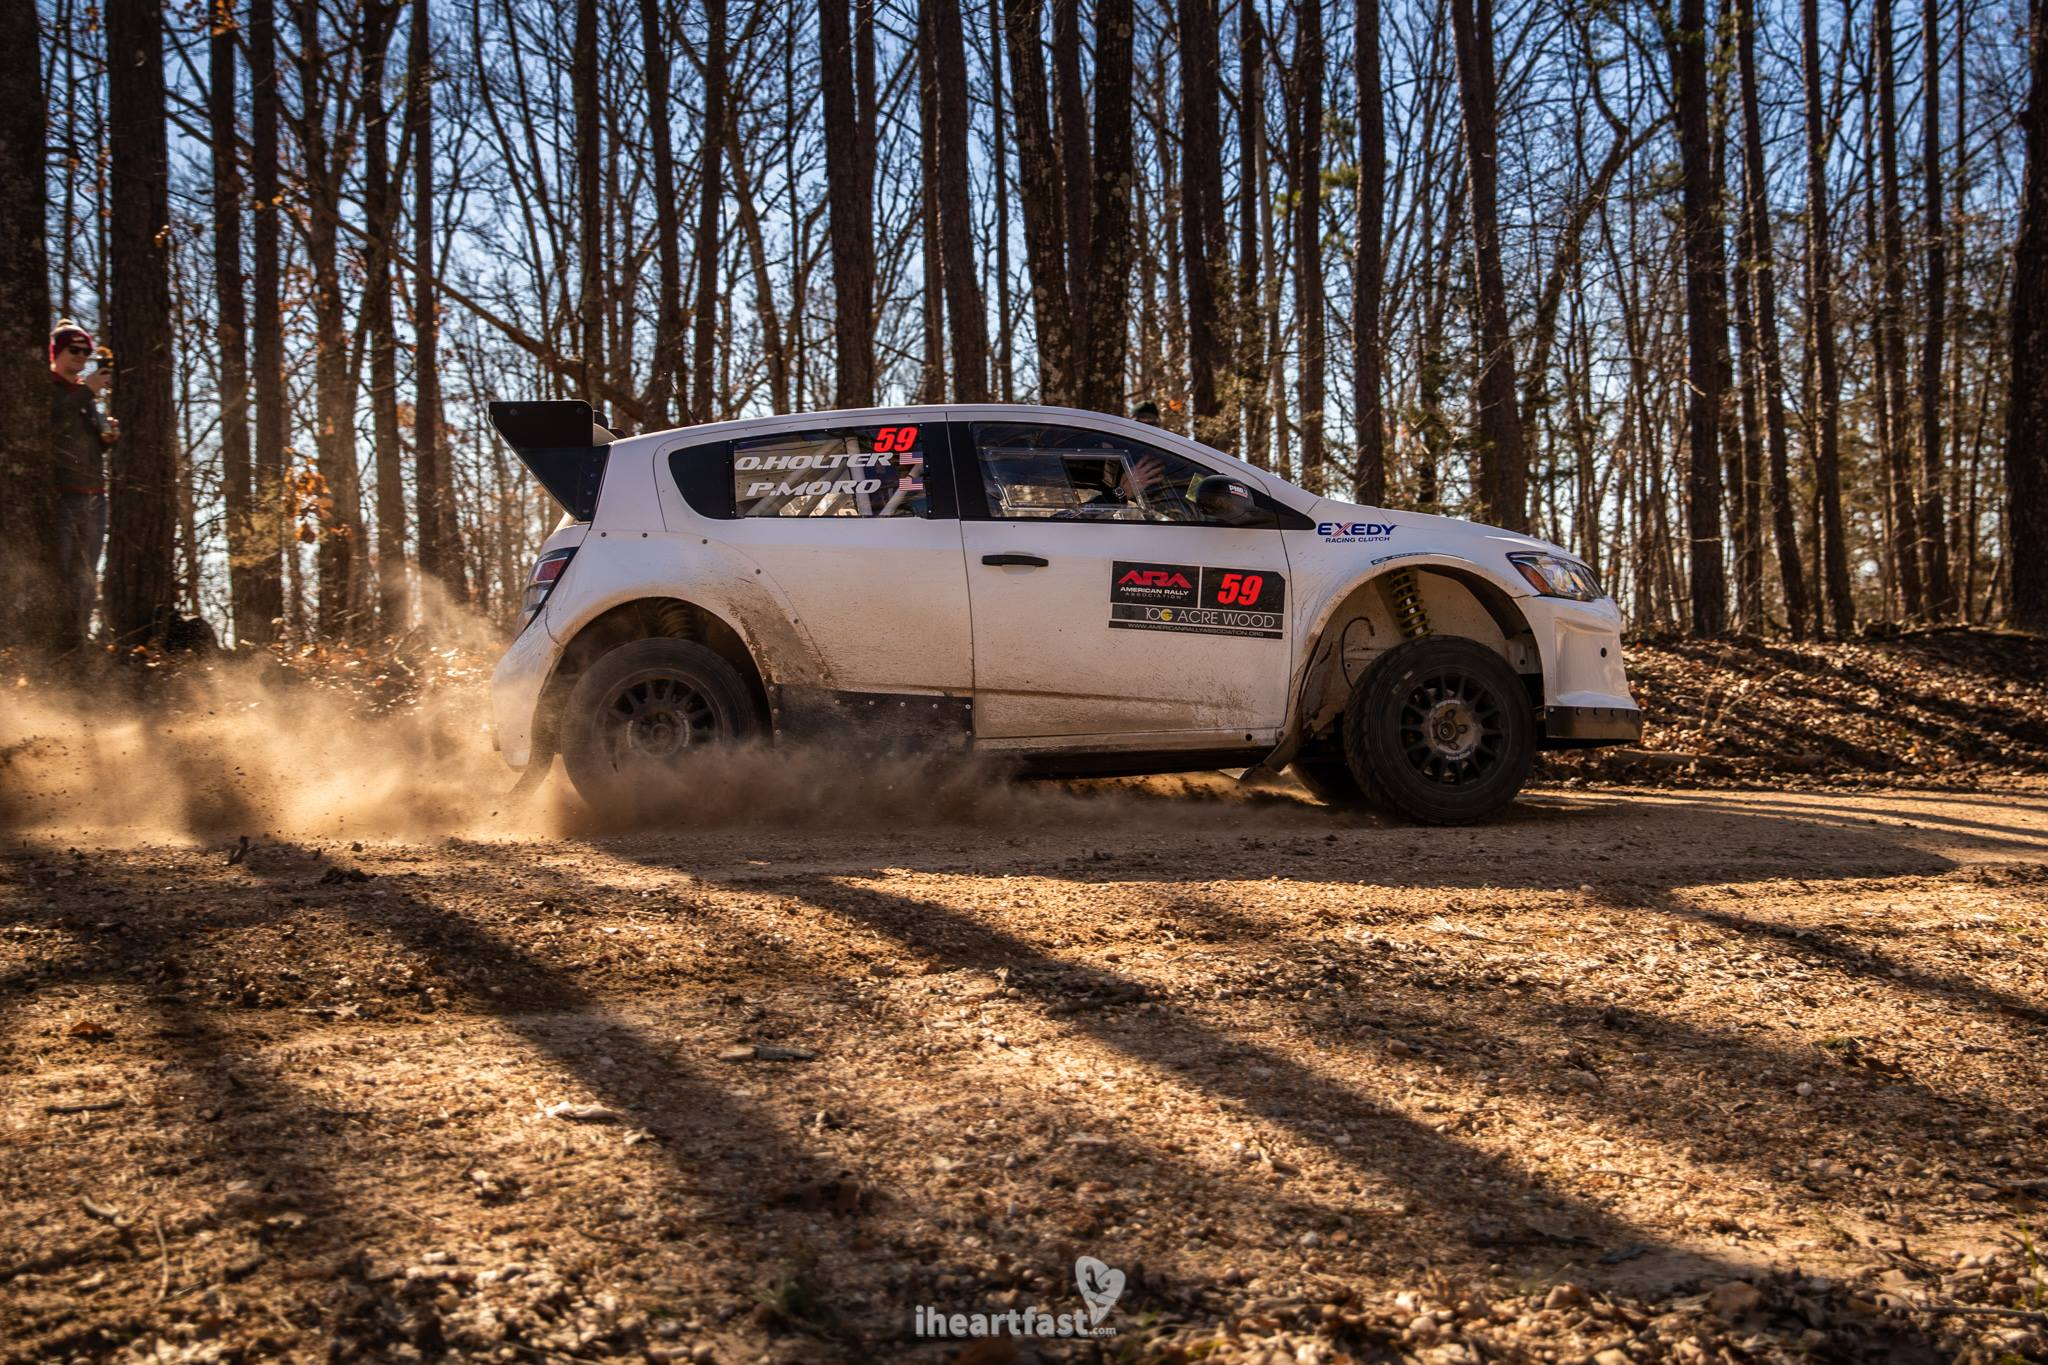 Patrick Moro in a v8 AWD Chevy Sonic